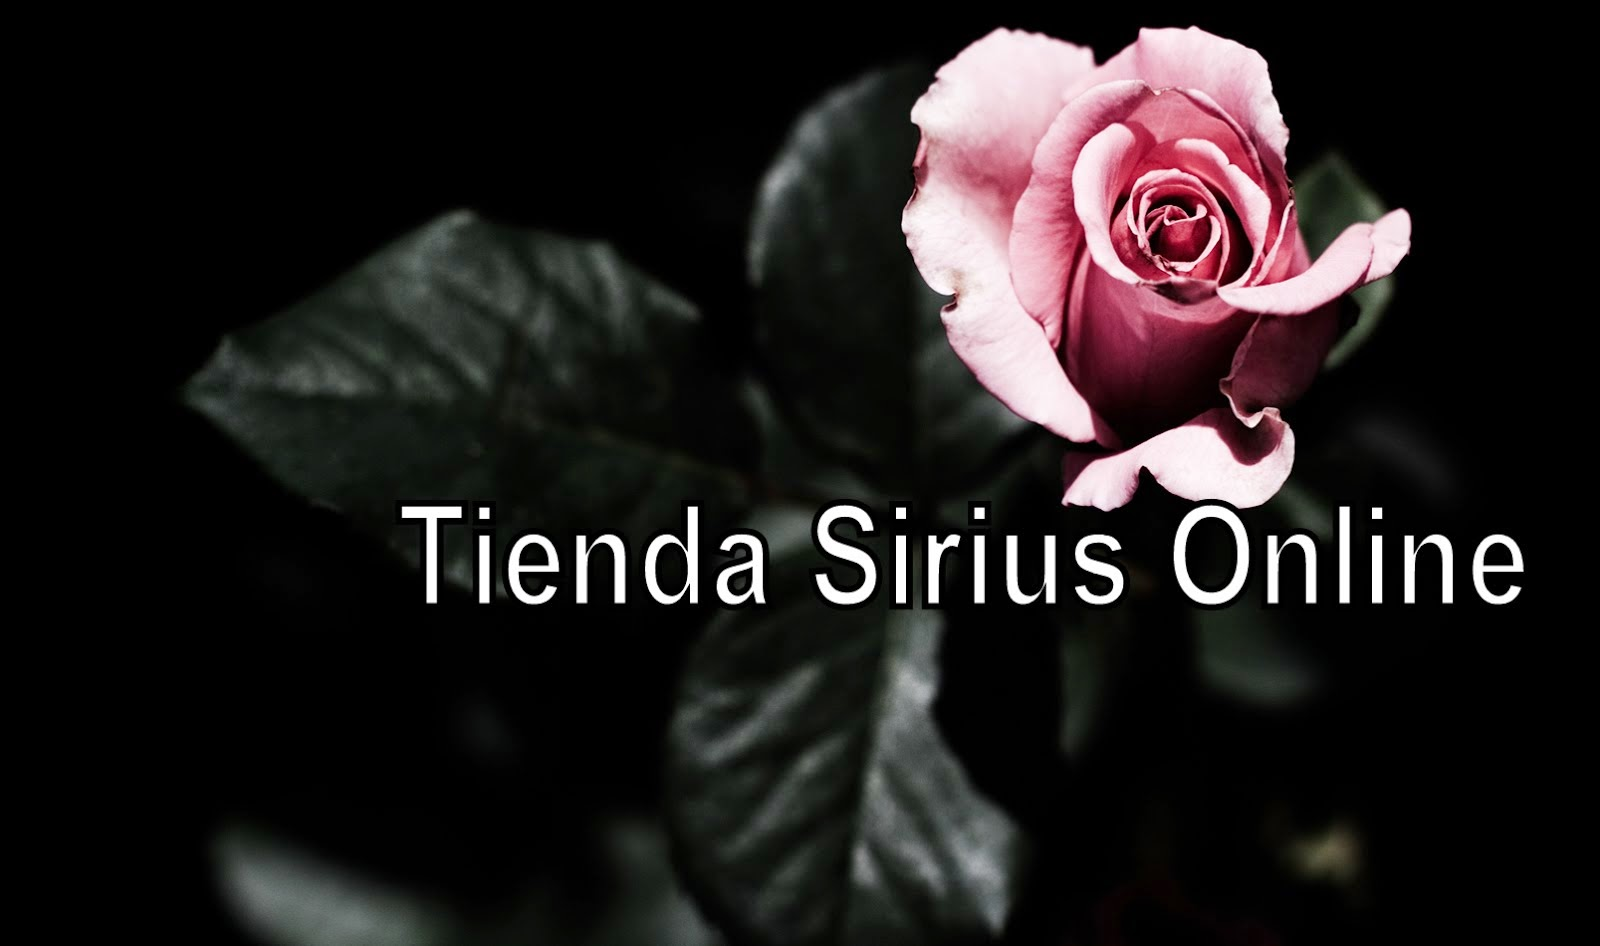 TIENDA SIRIUS ONLINE